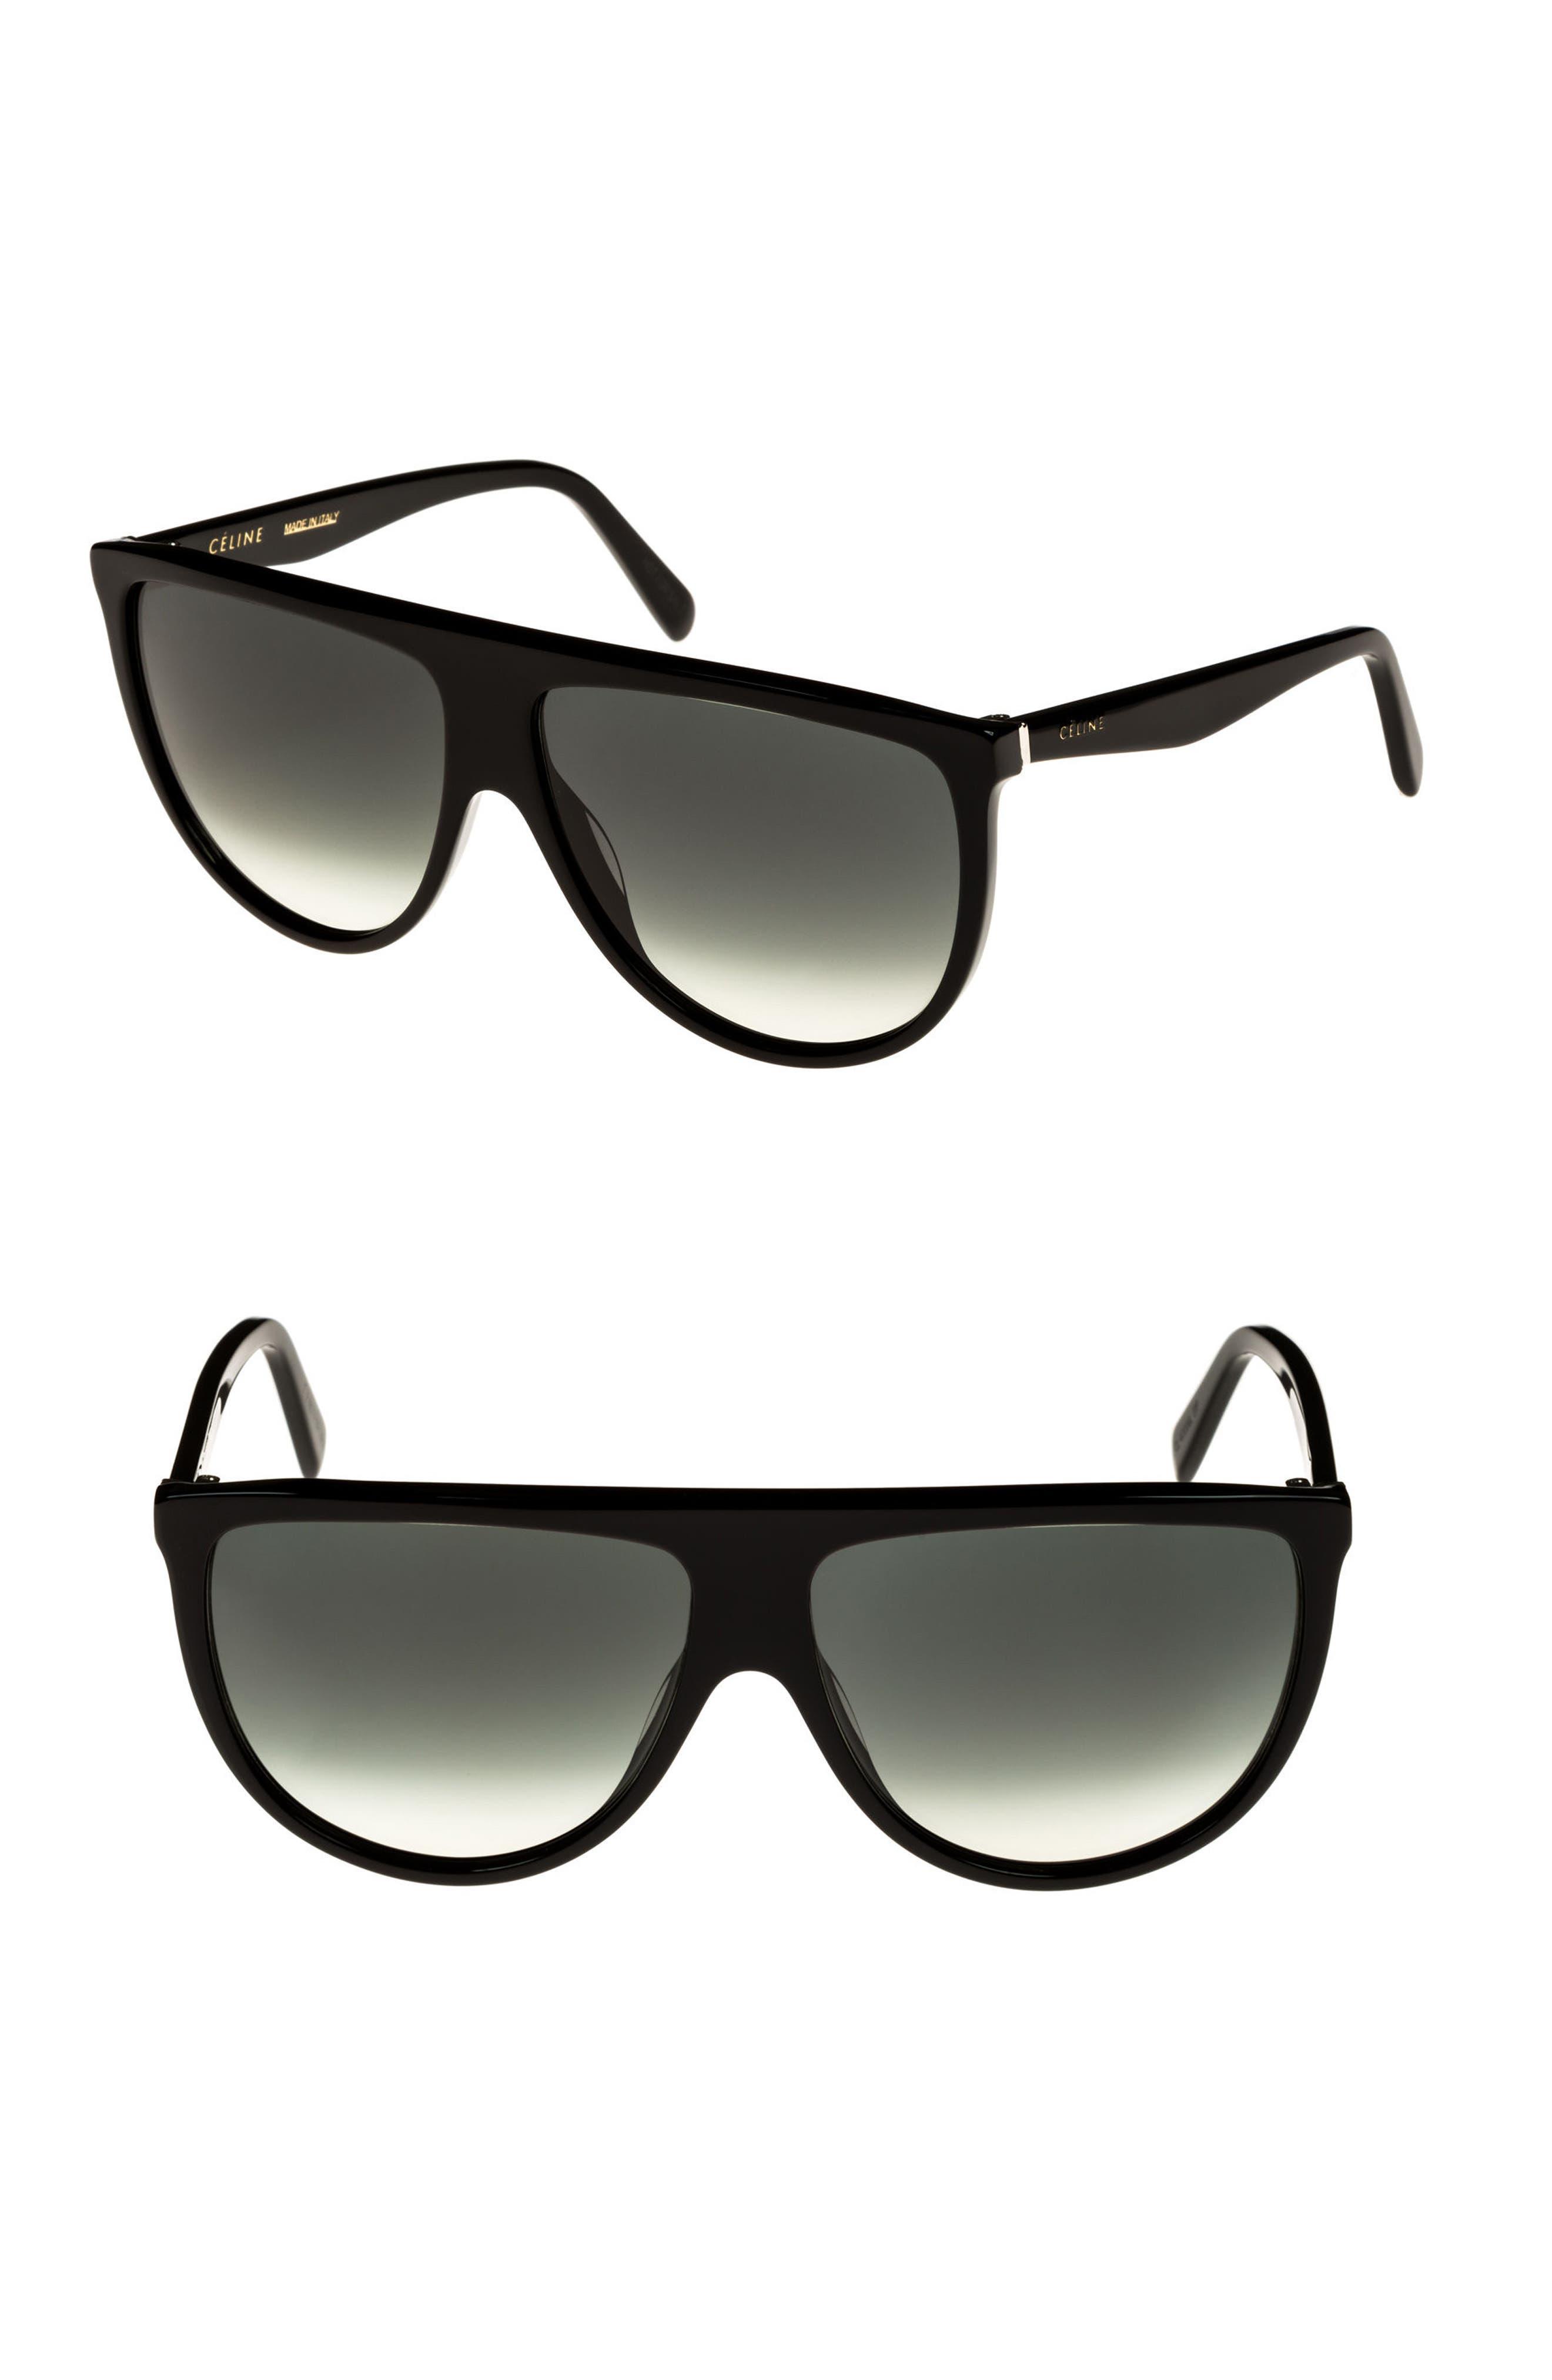 62mm Pilot Sunglasses,                         Main,                         color, Black/ Green